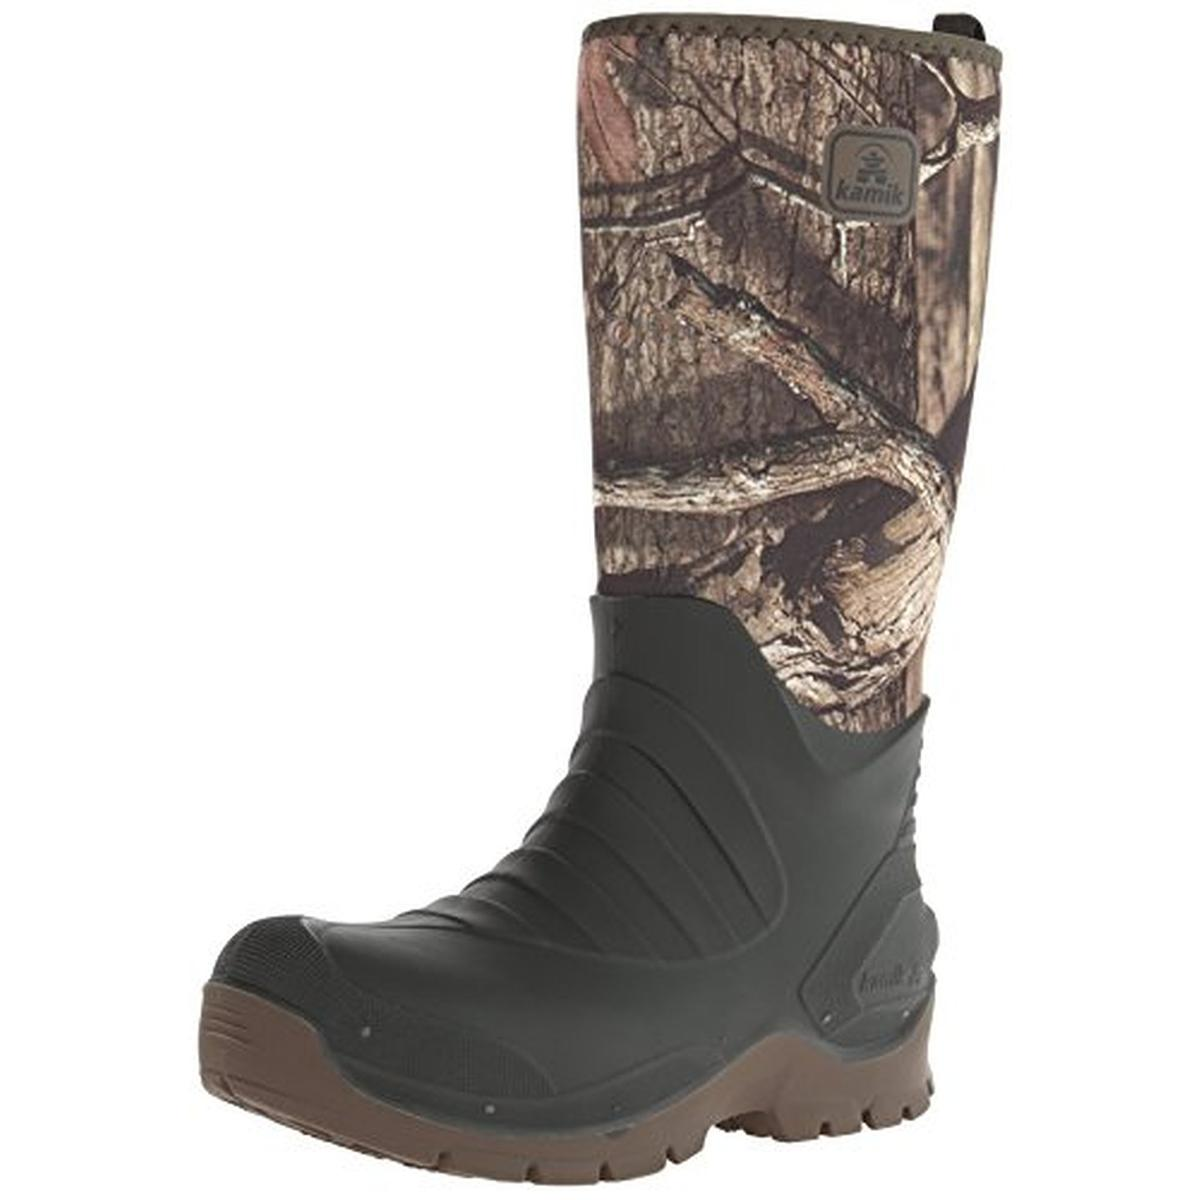 Kamik Mens Huntsman Waterproof Insulated Snow Boots